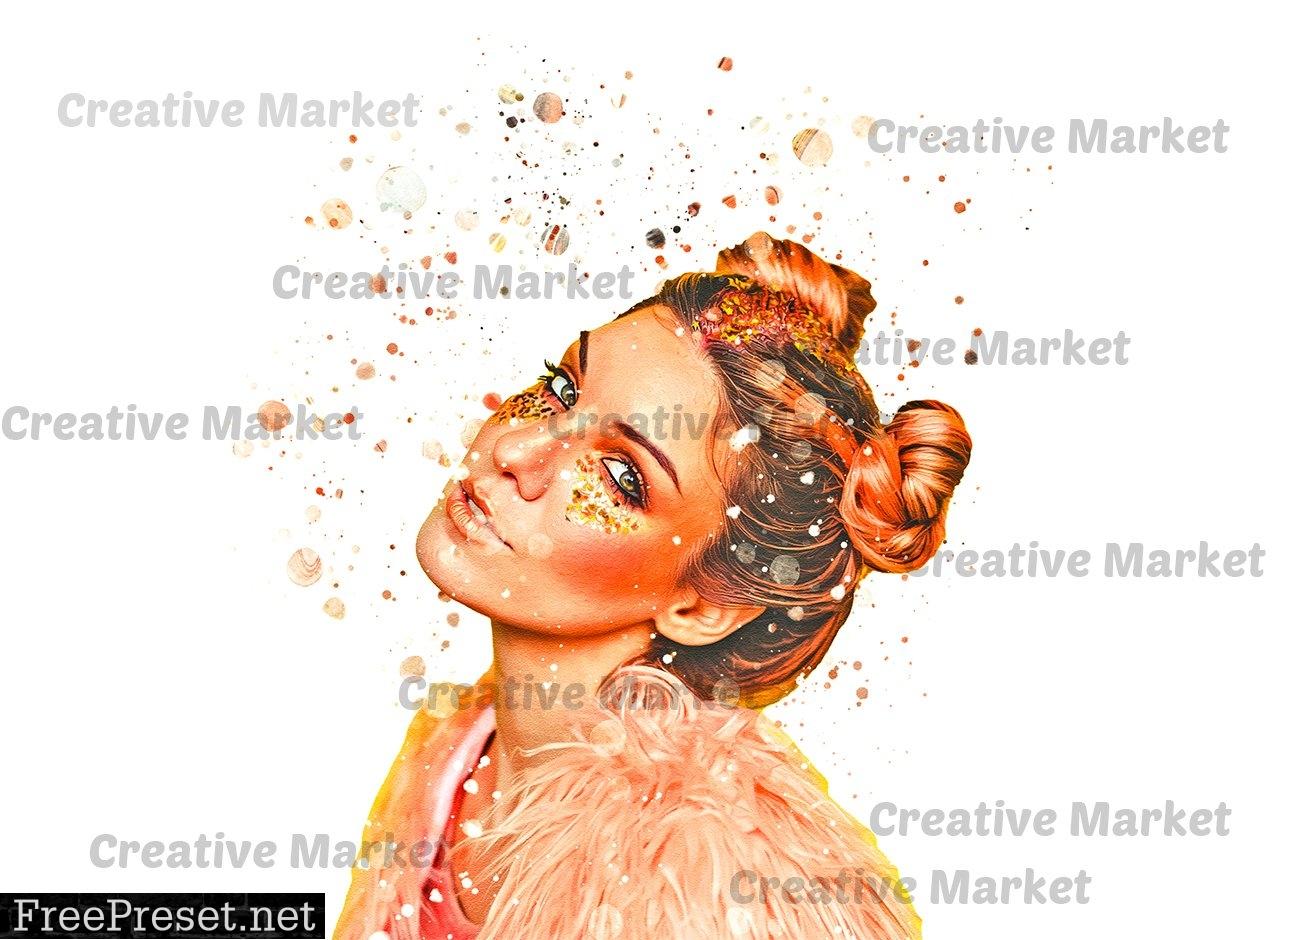 Paint Splatter Photoshop Action 6475081